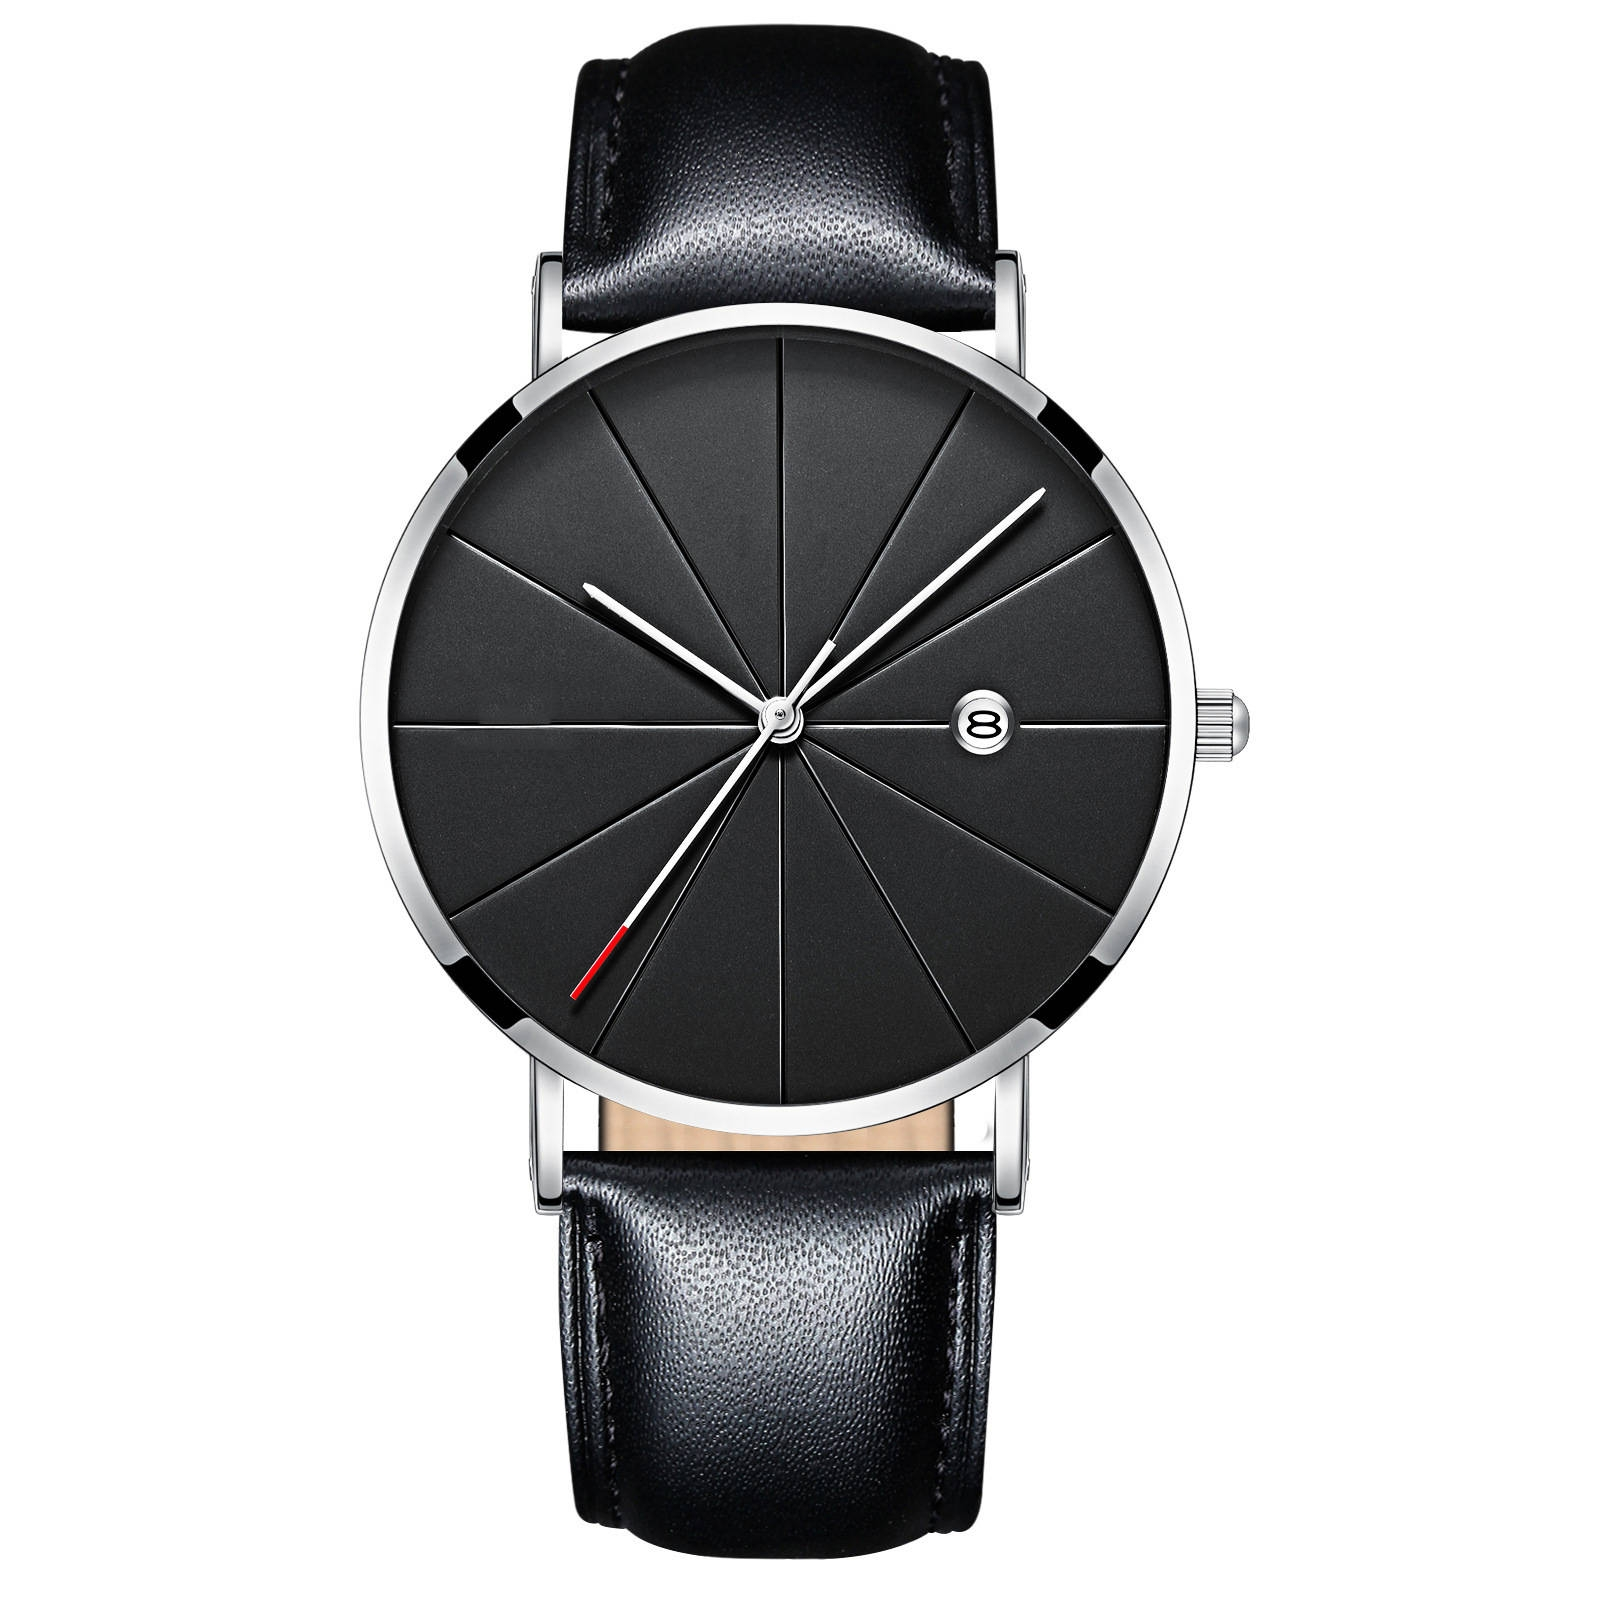 Luxury Watches Men Blue Stainless Steel Ultra Thin Watches Men Classic Quartz Date Men's Wrist Watch black+rose gold 25cm 4